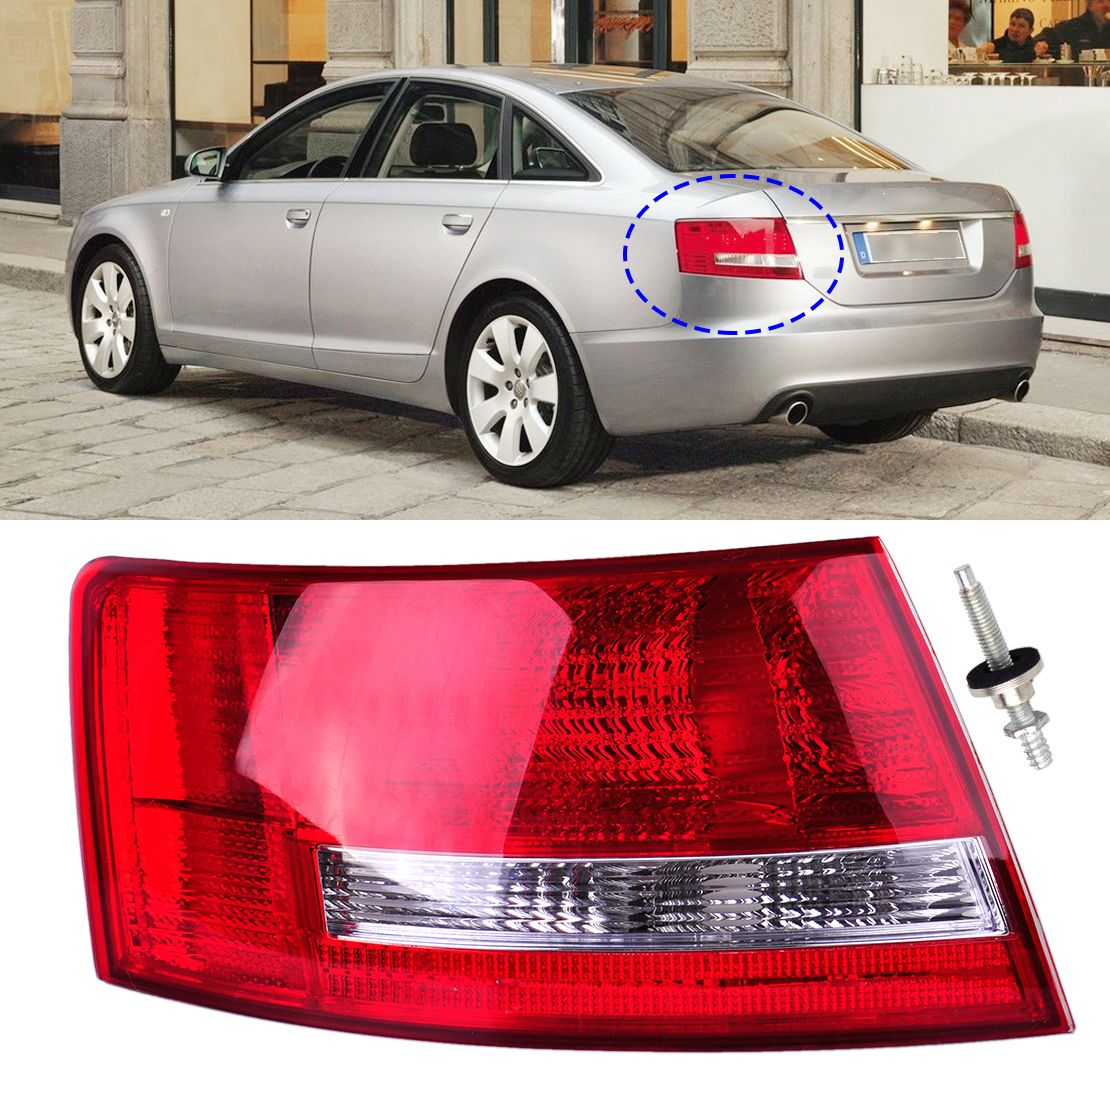 Left Tail Light Assembly Lamp Housing Without Bulb Fit For Audi A6 A6 Quattro Sedan 2005 2006 2007 2008 4f5945095l 4f594509 Audi A6 Audi A6 Quattro Car Lights